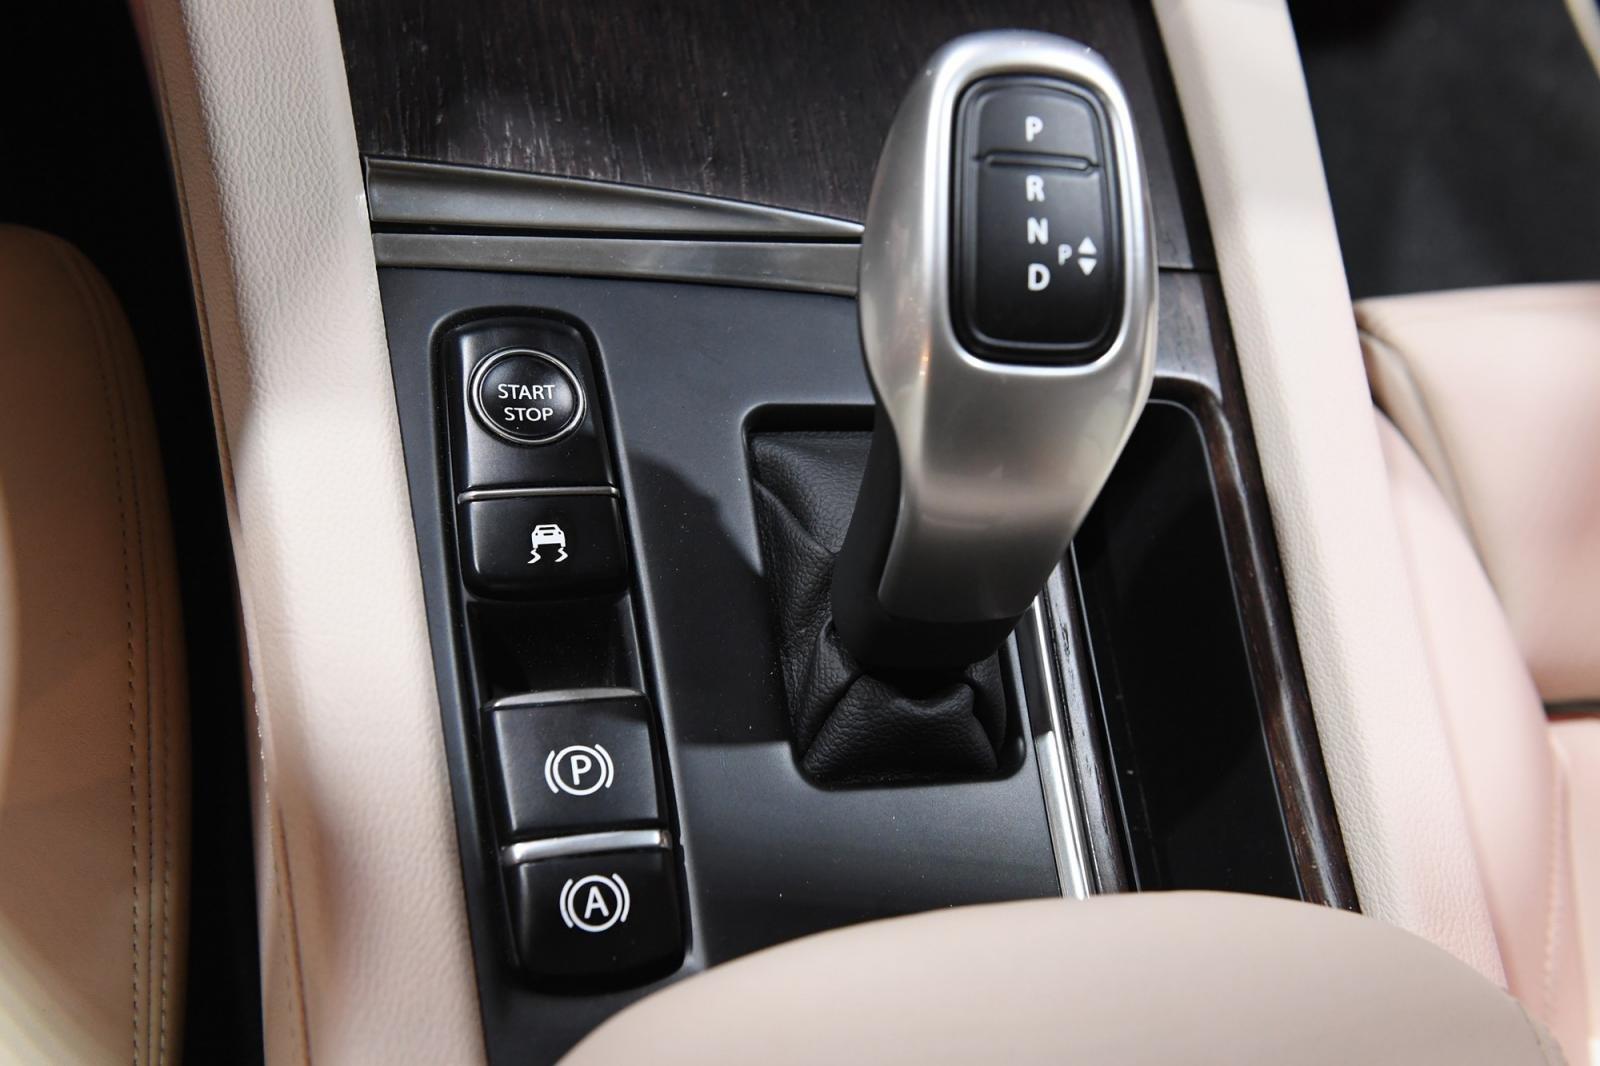 VinFast LUX SA2.0 cao cấp và Ford Everest Titanium về an toàn 1